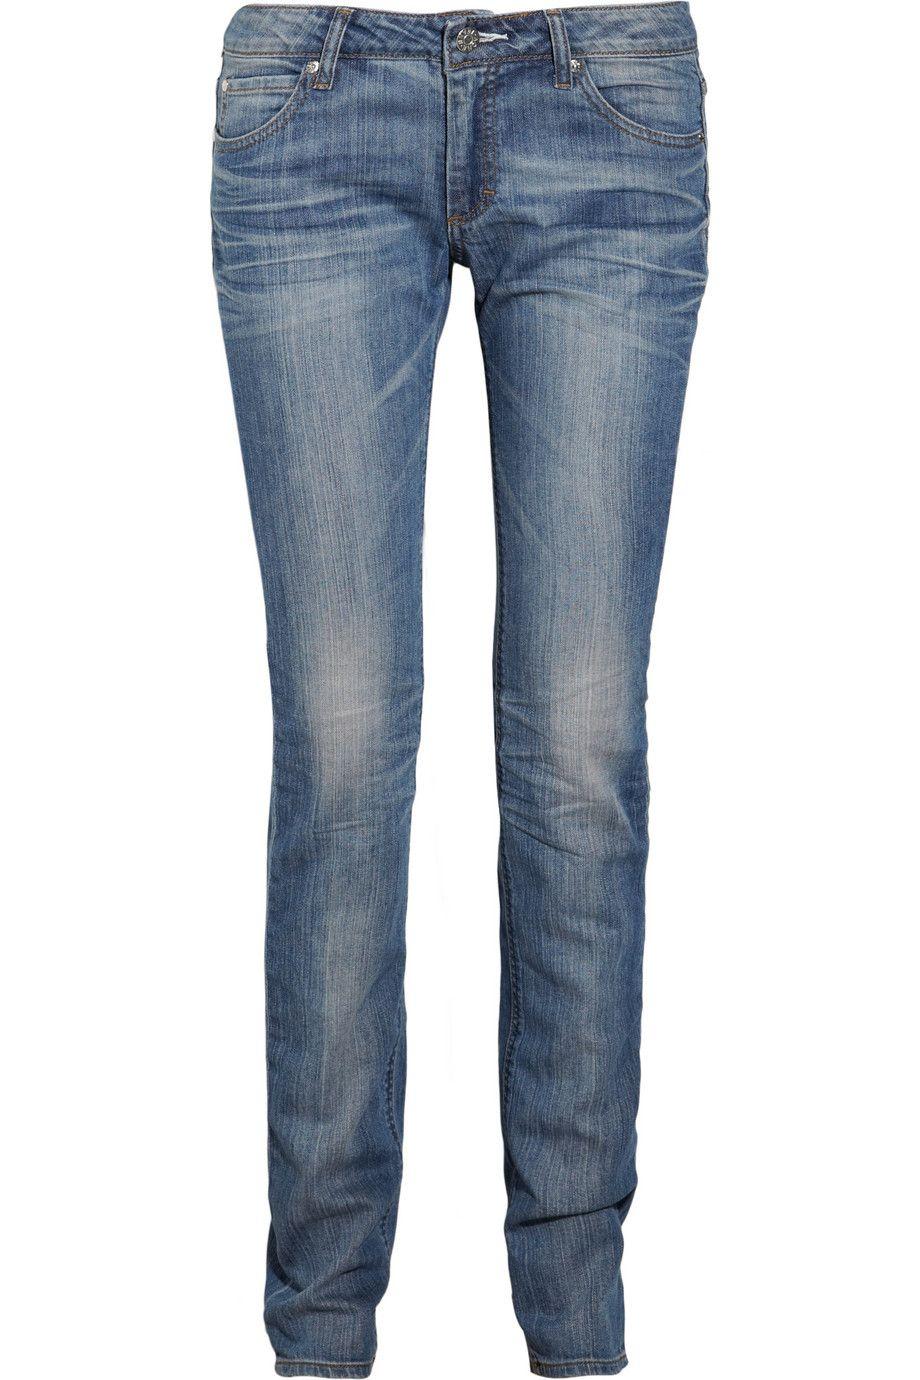 17 Best images about Jeans on Pinterest | Buy jeans, Purple jeans ...